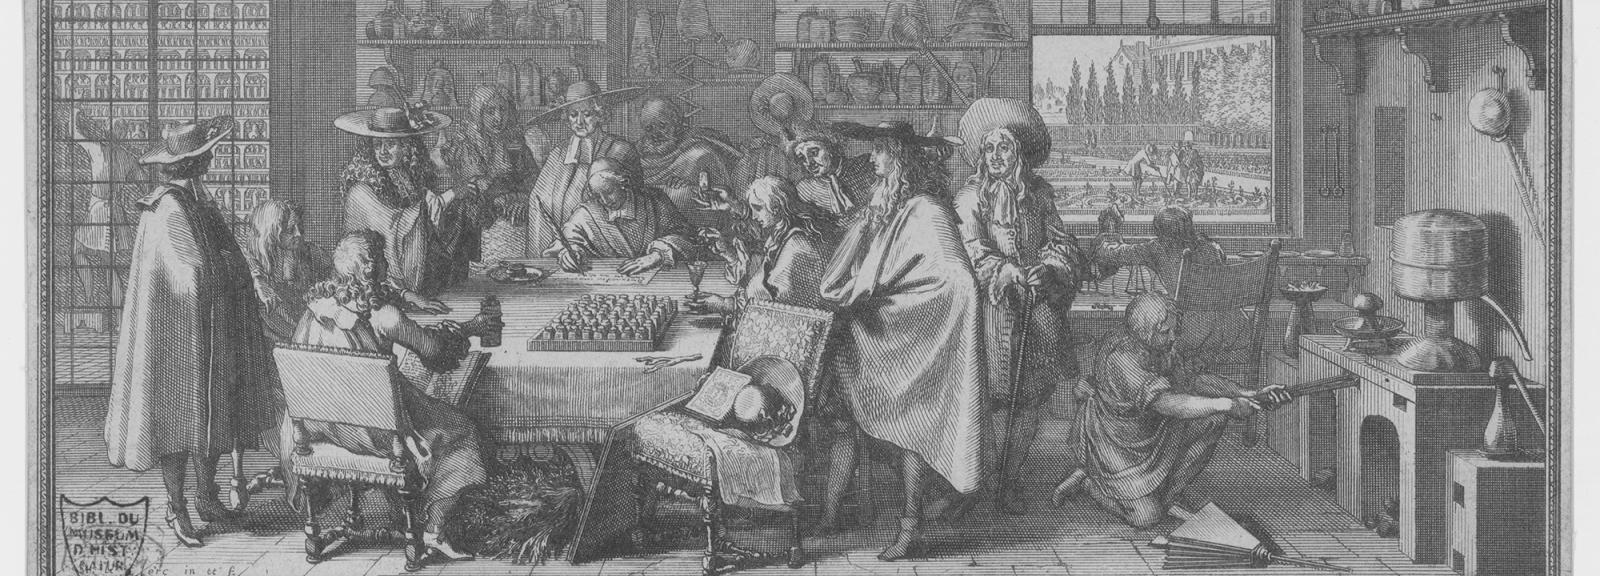 The Garden's medicine cabinet and chemistry laboratory (1676) - Sébastien Leclerc (1637-1714) © MNHN - Direction des Bibliothèques